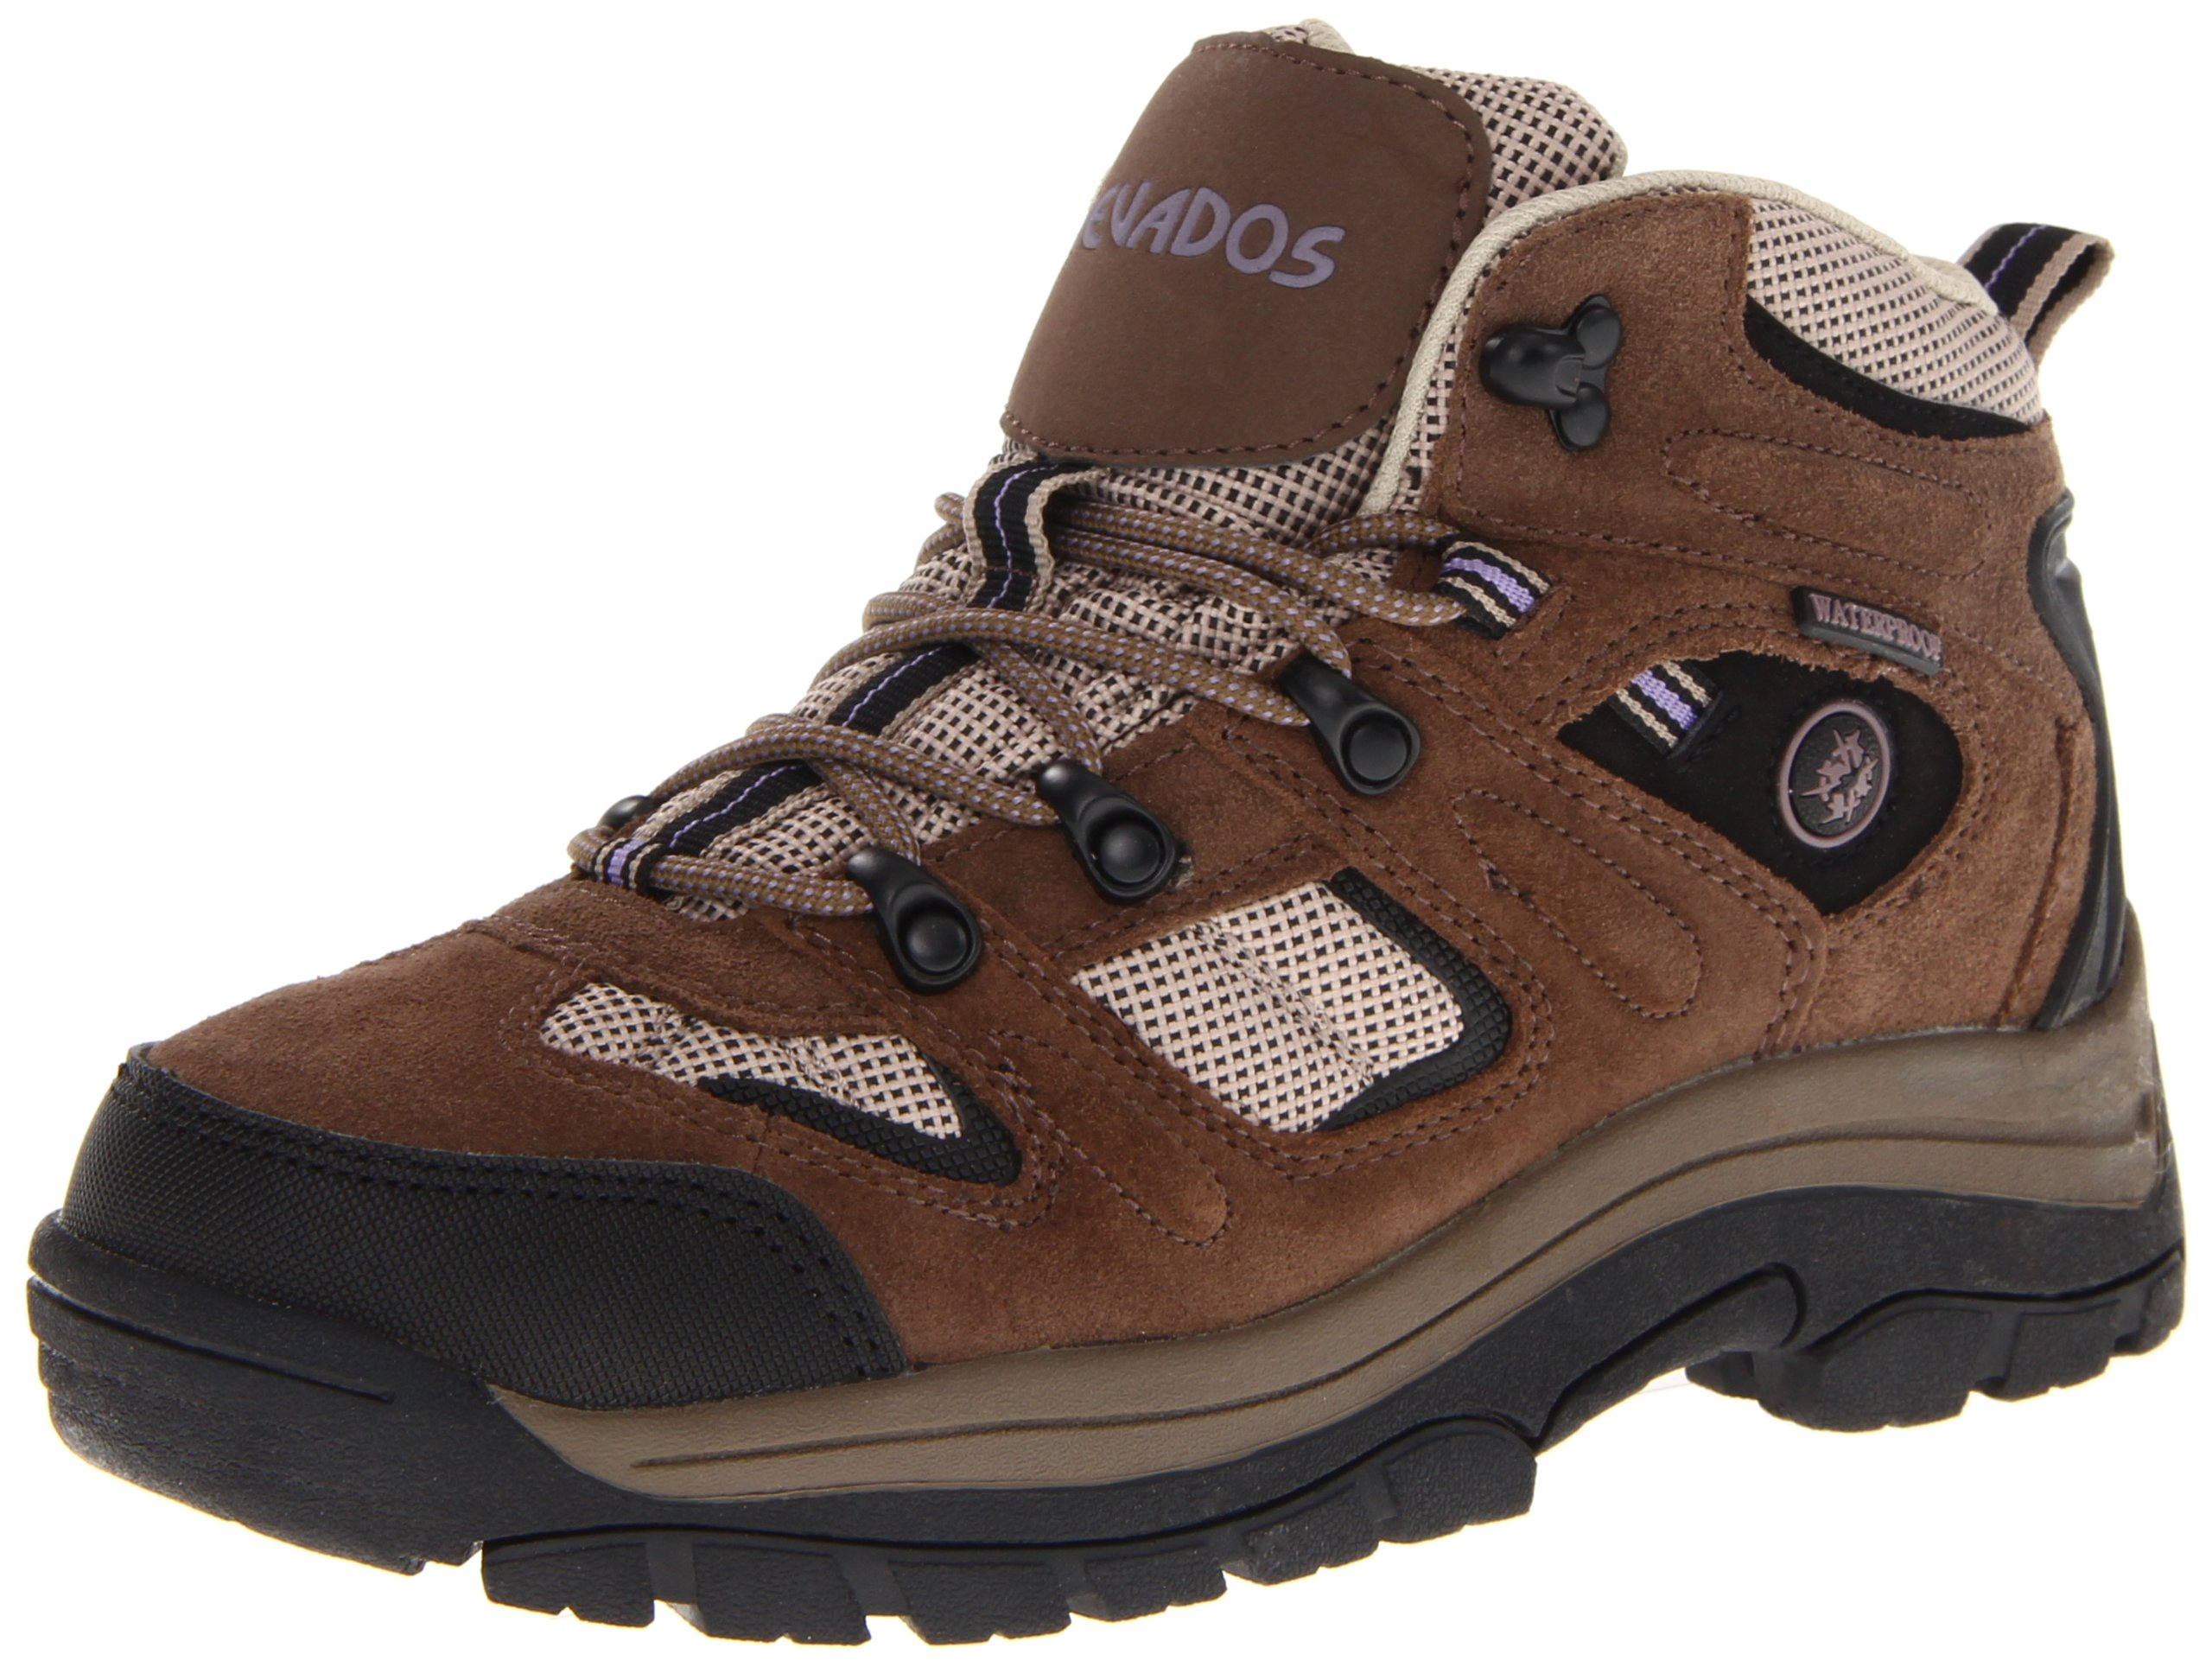 Nevados Women's Klondike Waterproof V1173W Hiking Boot,Dark Brown/Black/Taupe,9.5 M US